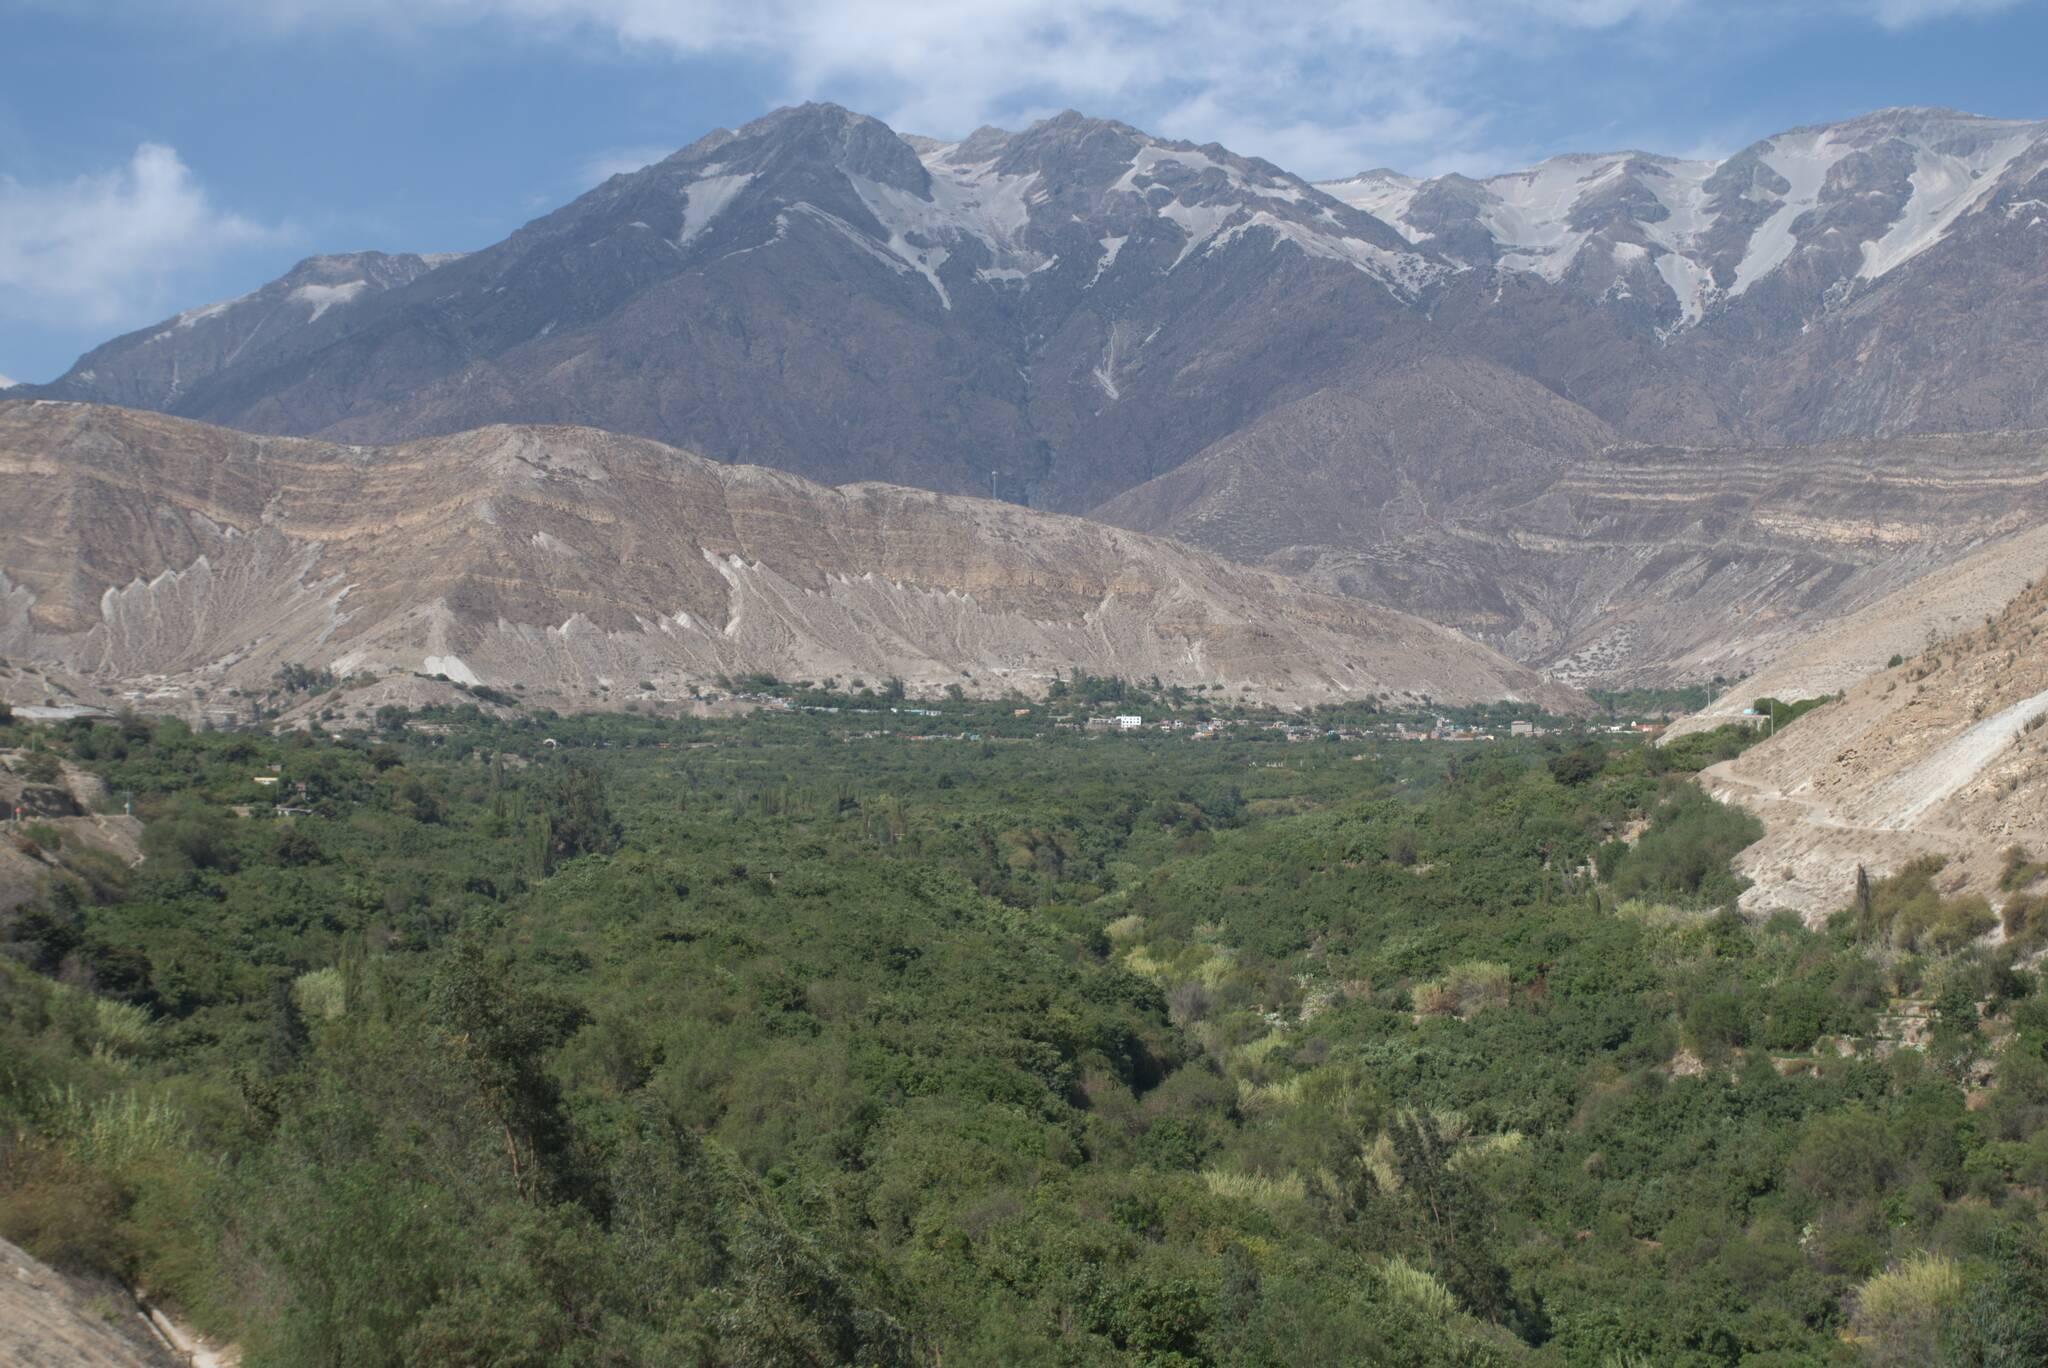 Miejscowość Omate u podnóża gór